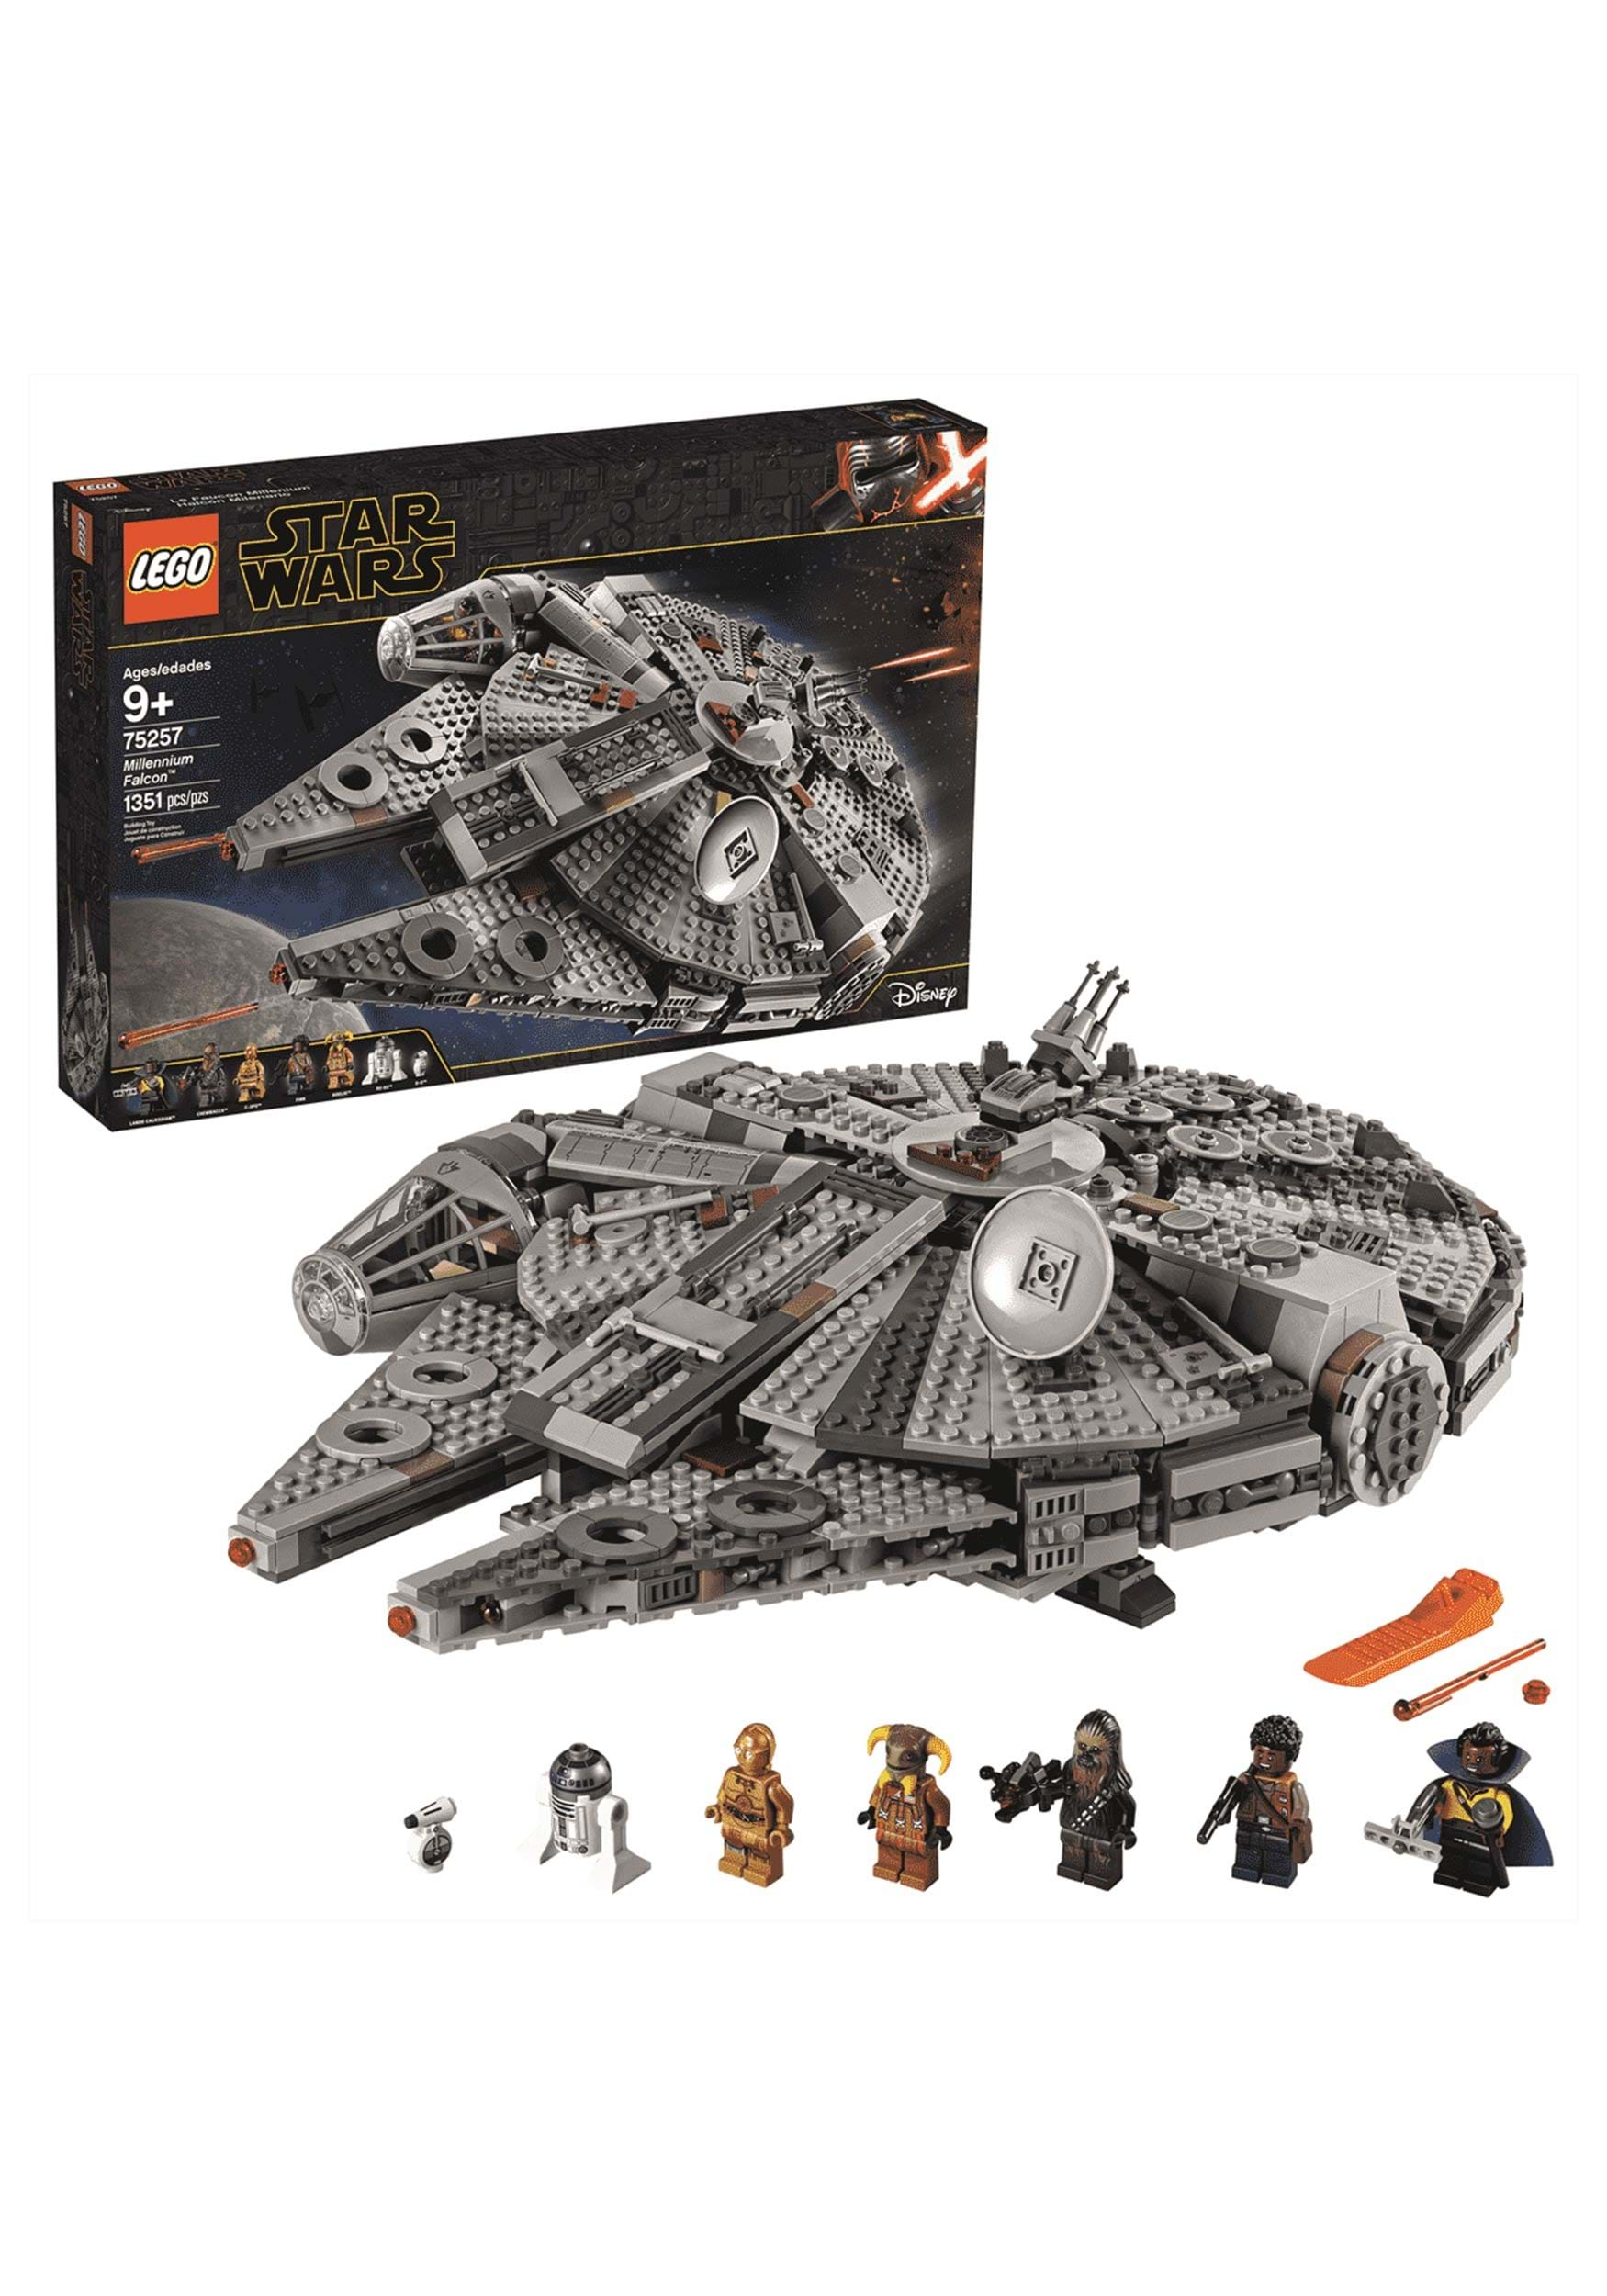 Millennium Falcon from LEGO